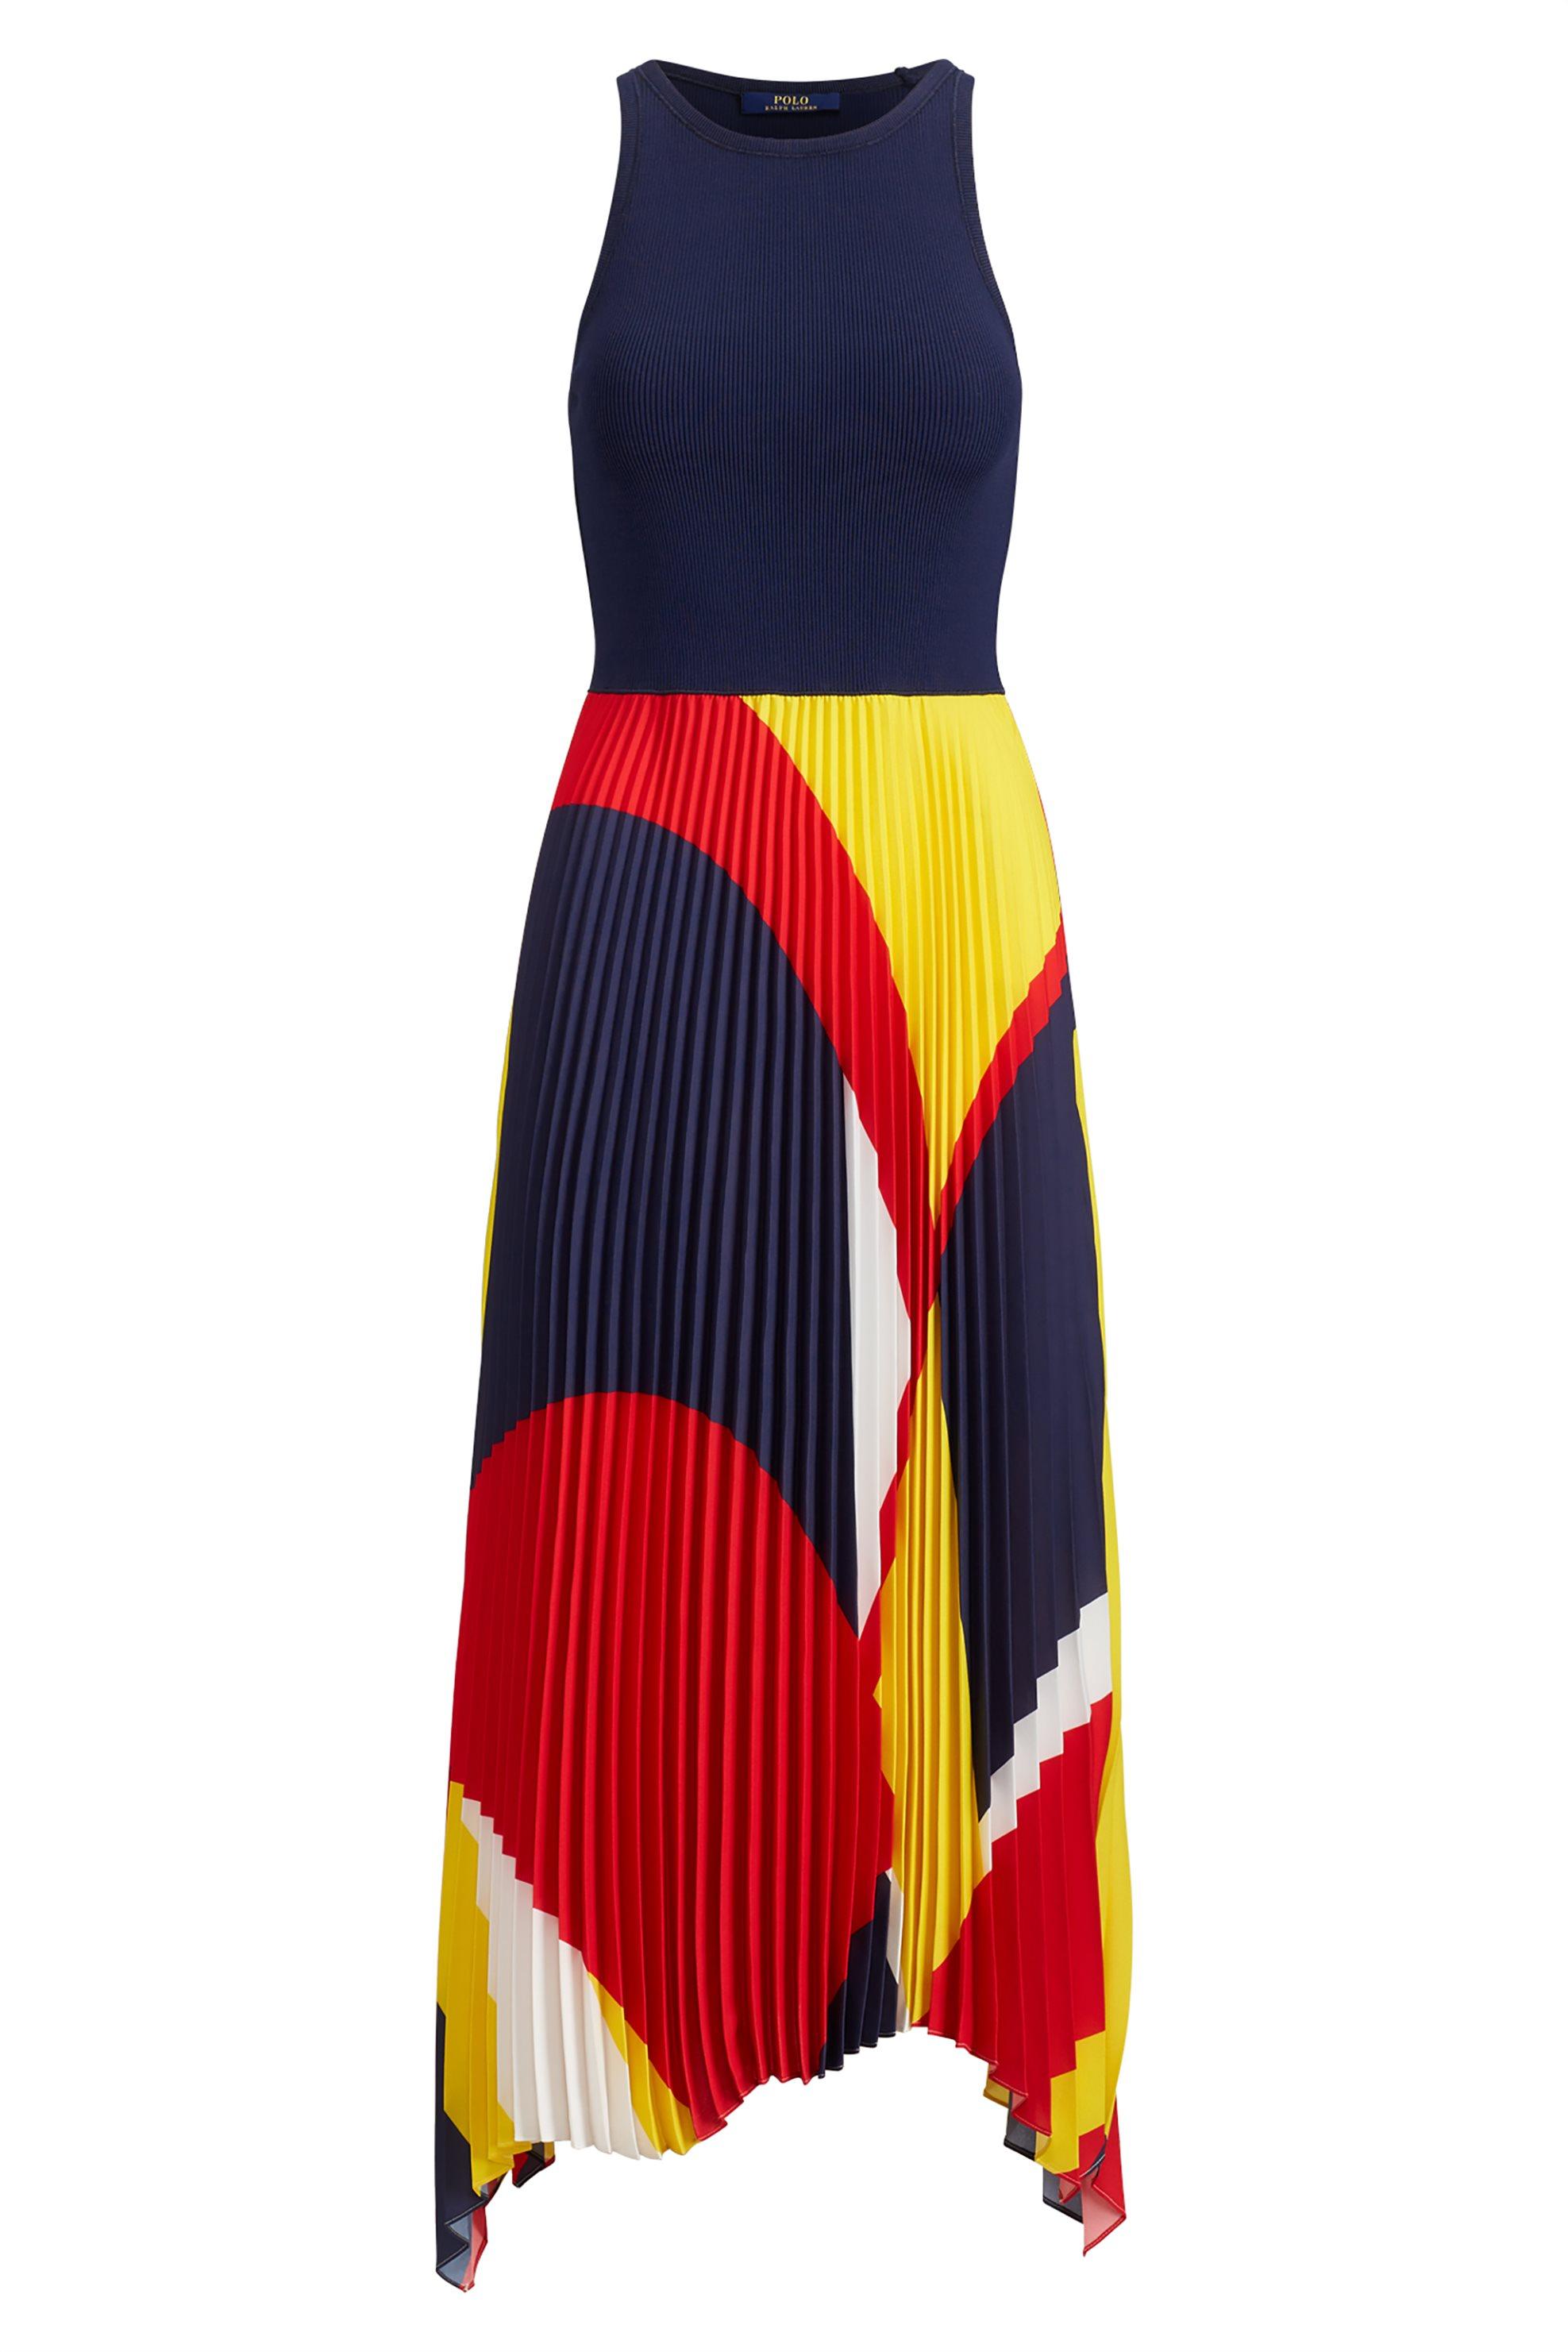 5b38275e5ddd Polo Ralph Lauren γυναικείο αμάνικο φόρεμα Pleated Georgette - 211733678001  - Μπλε Σκούρο